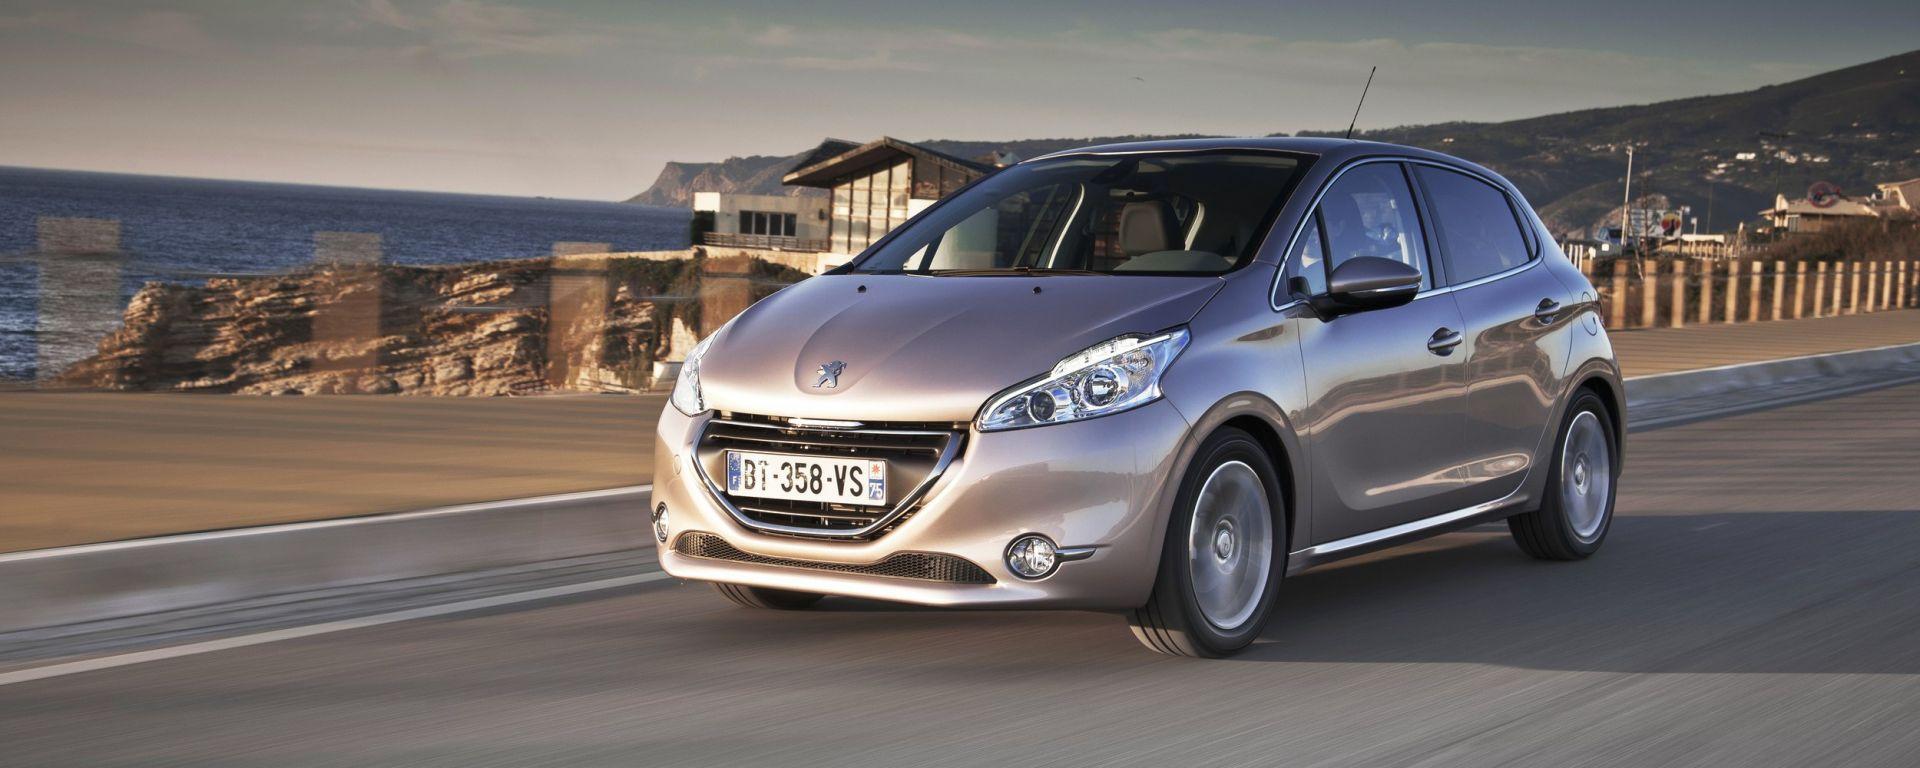 Peugeot 208 1.2 VTi: un jolly per tutti